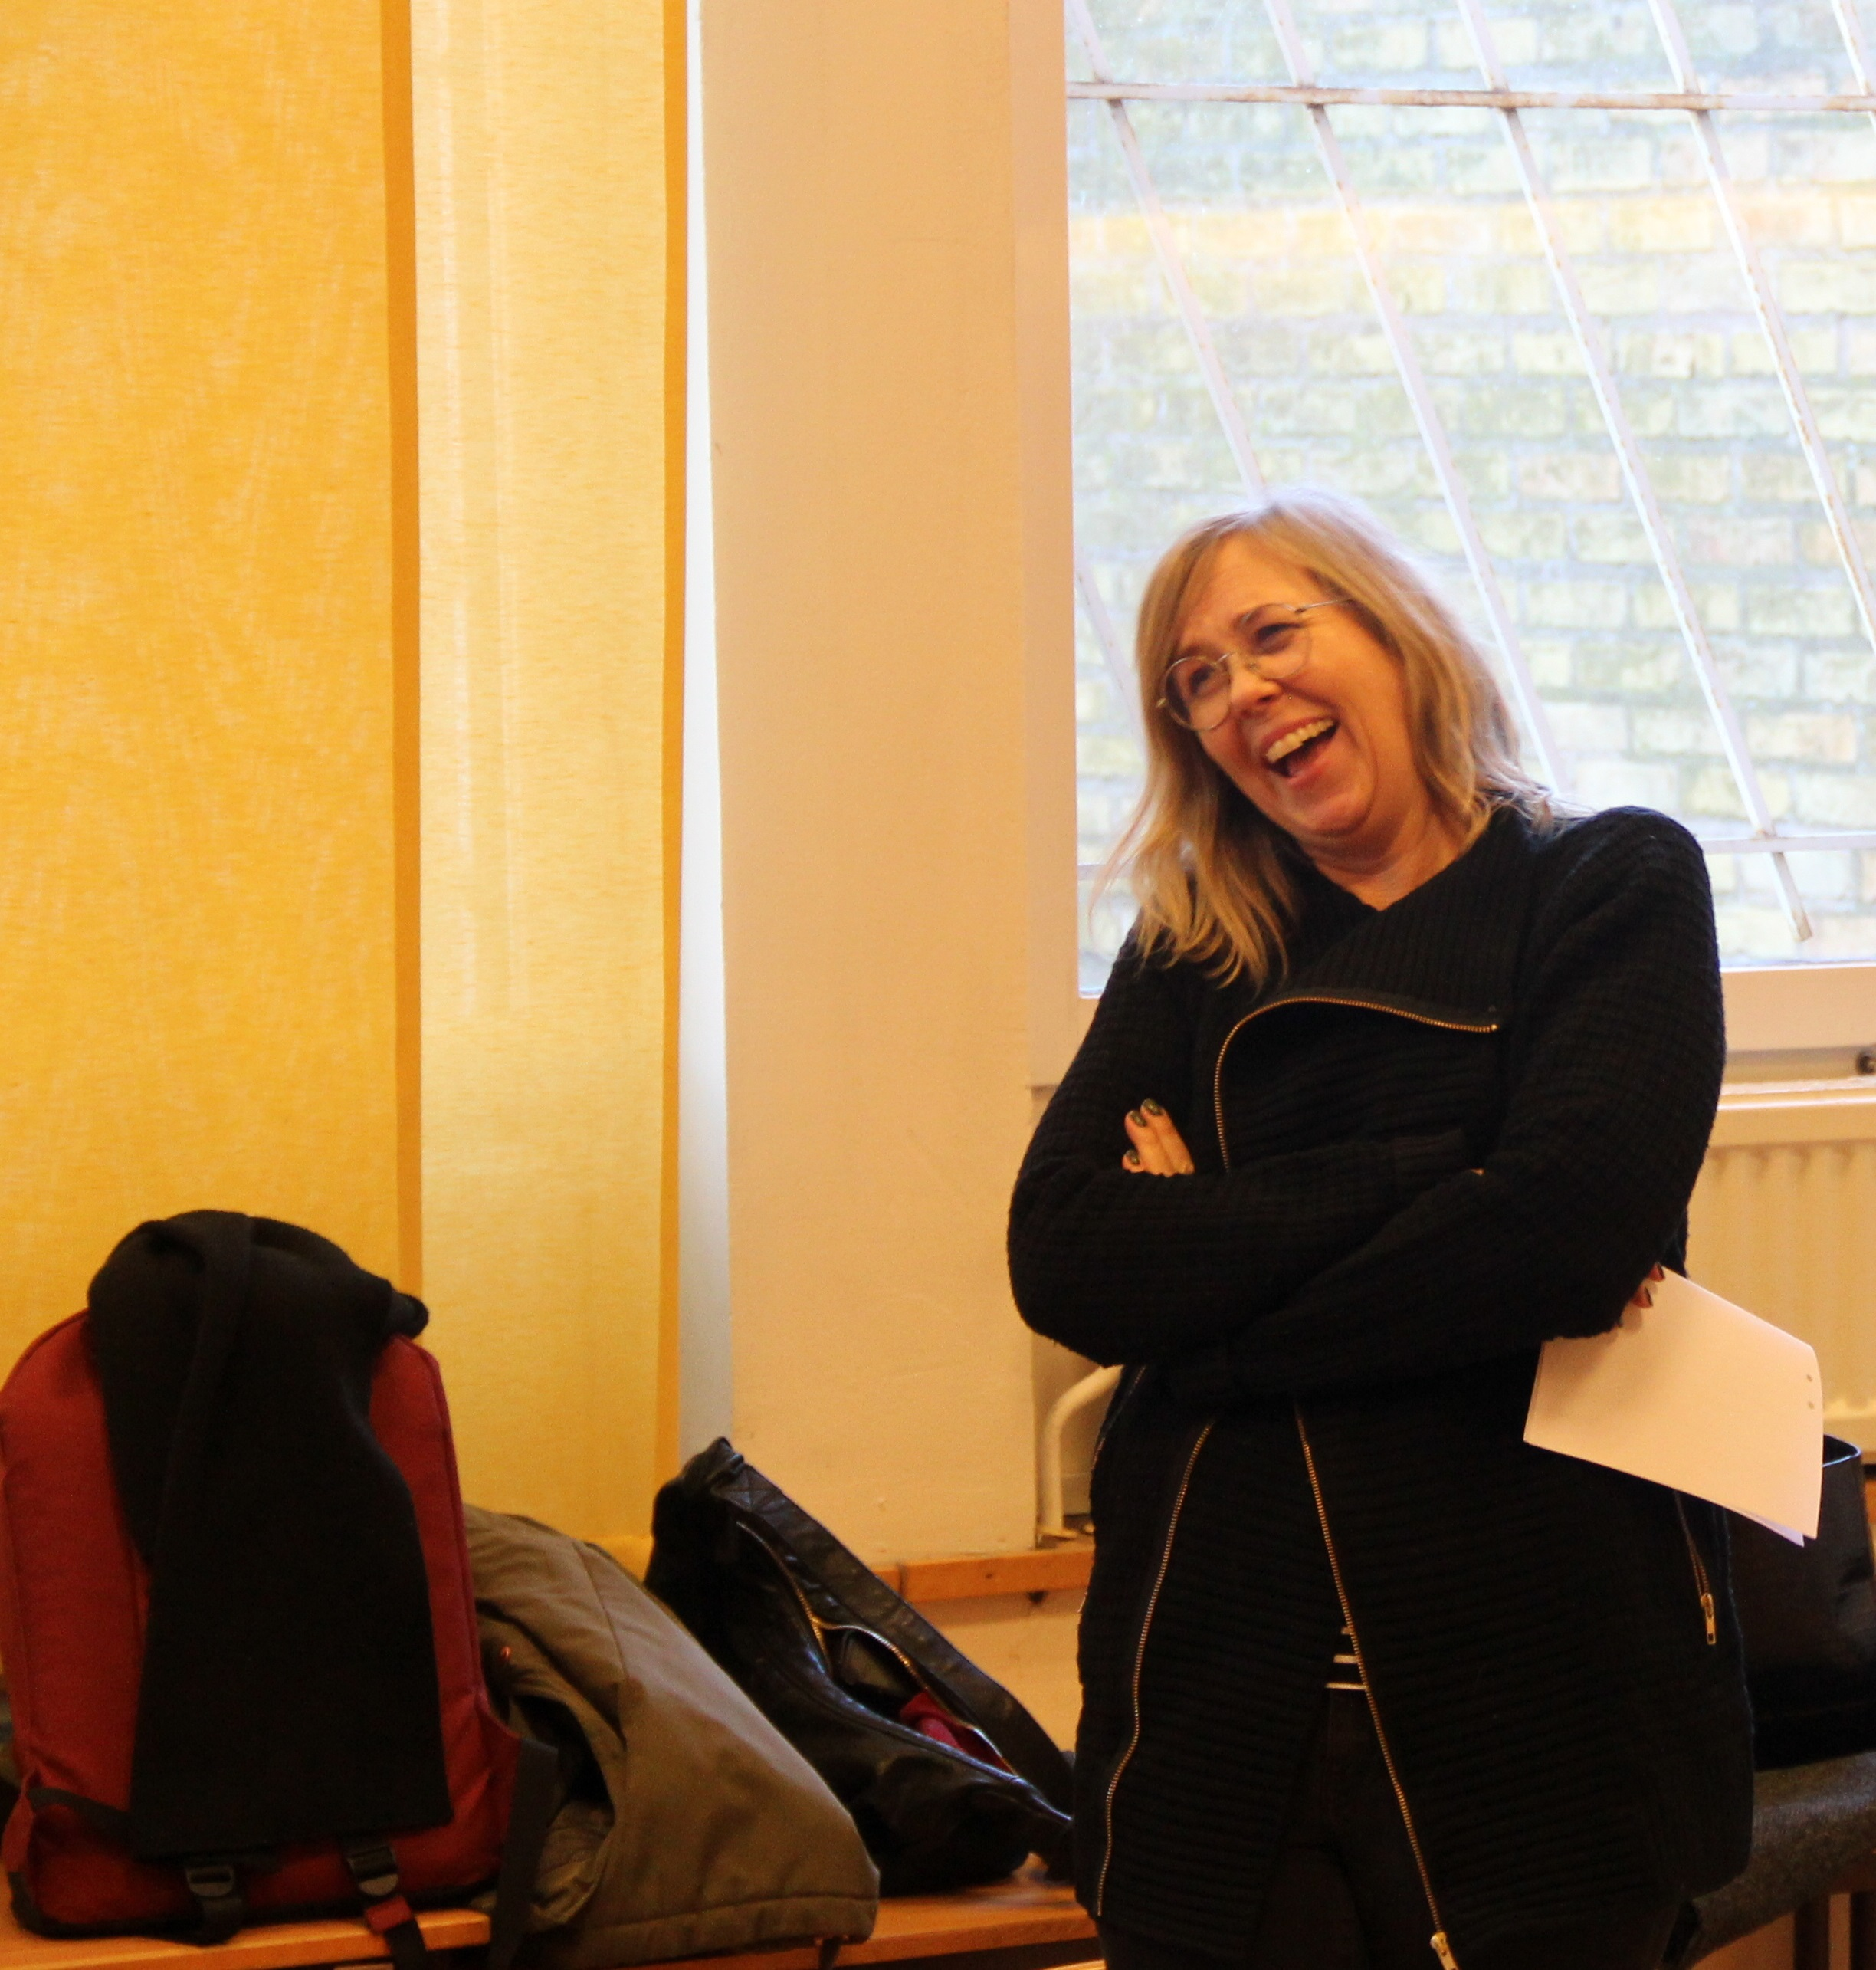 Sara Kadefors skrattar.